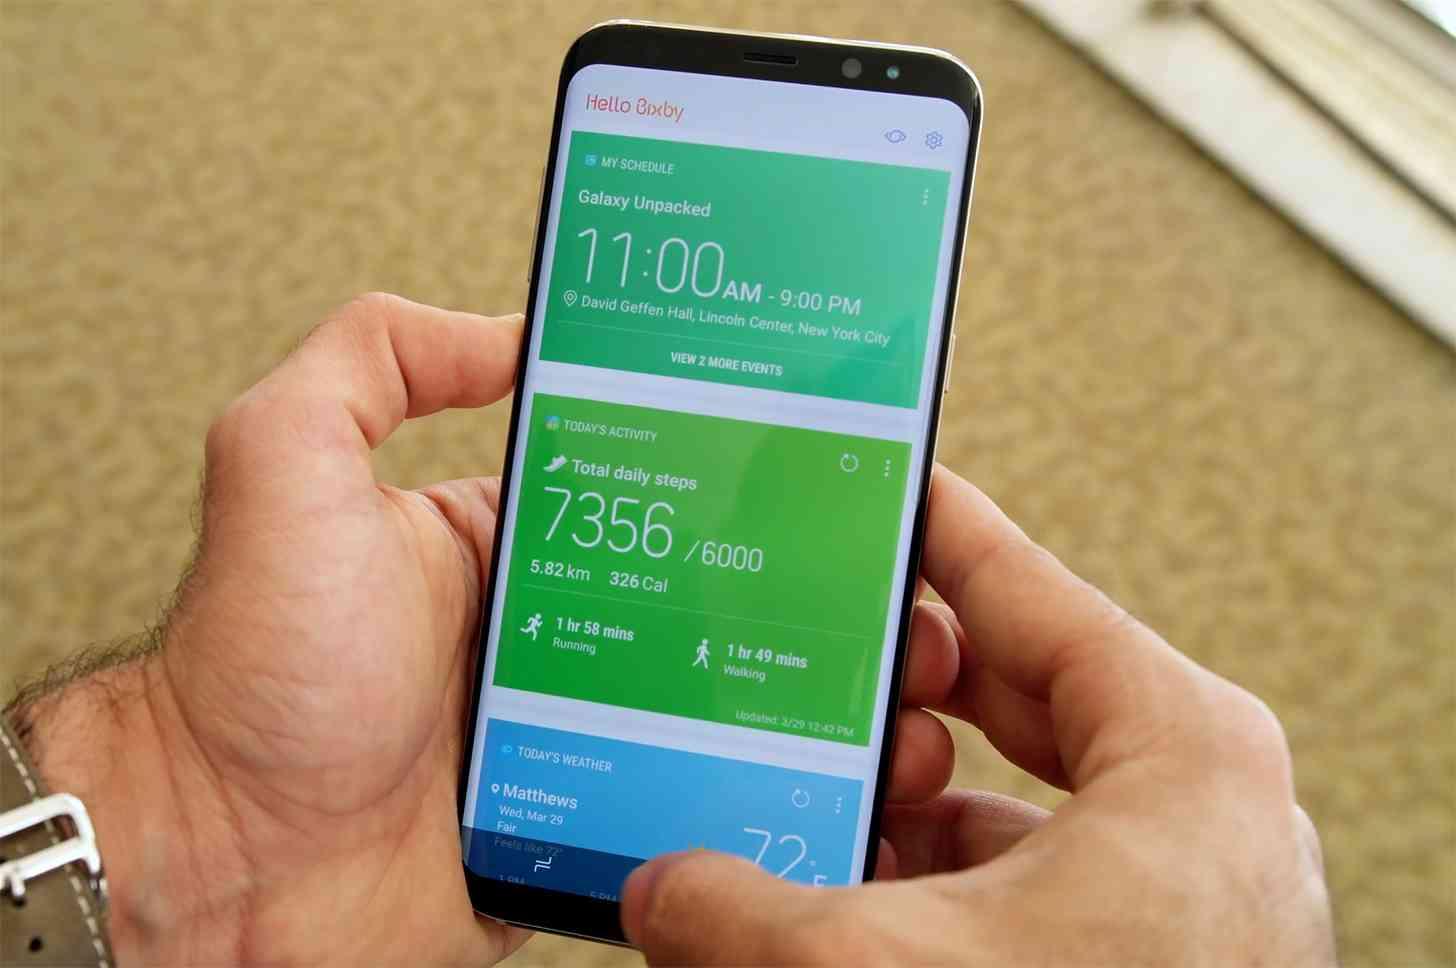 Samsung Galaxy S8 Bixby hands-on